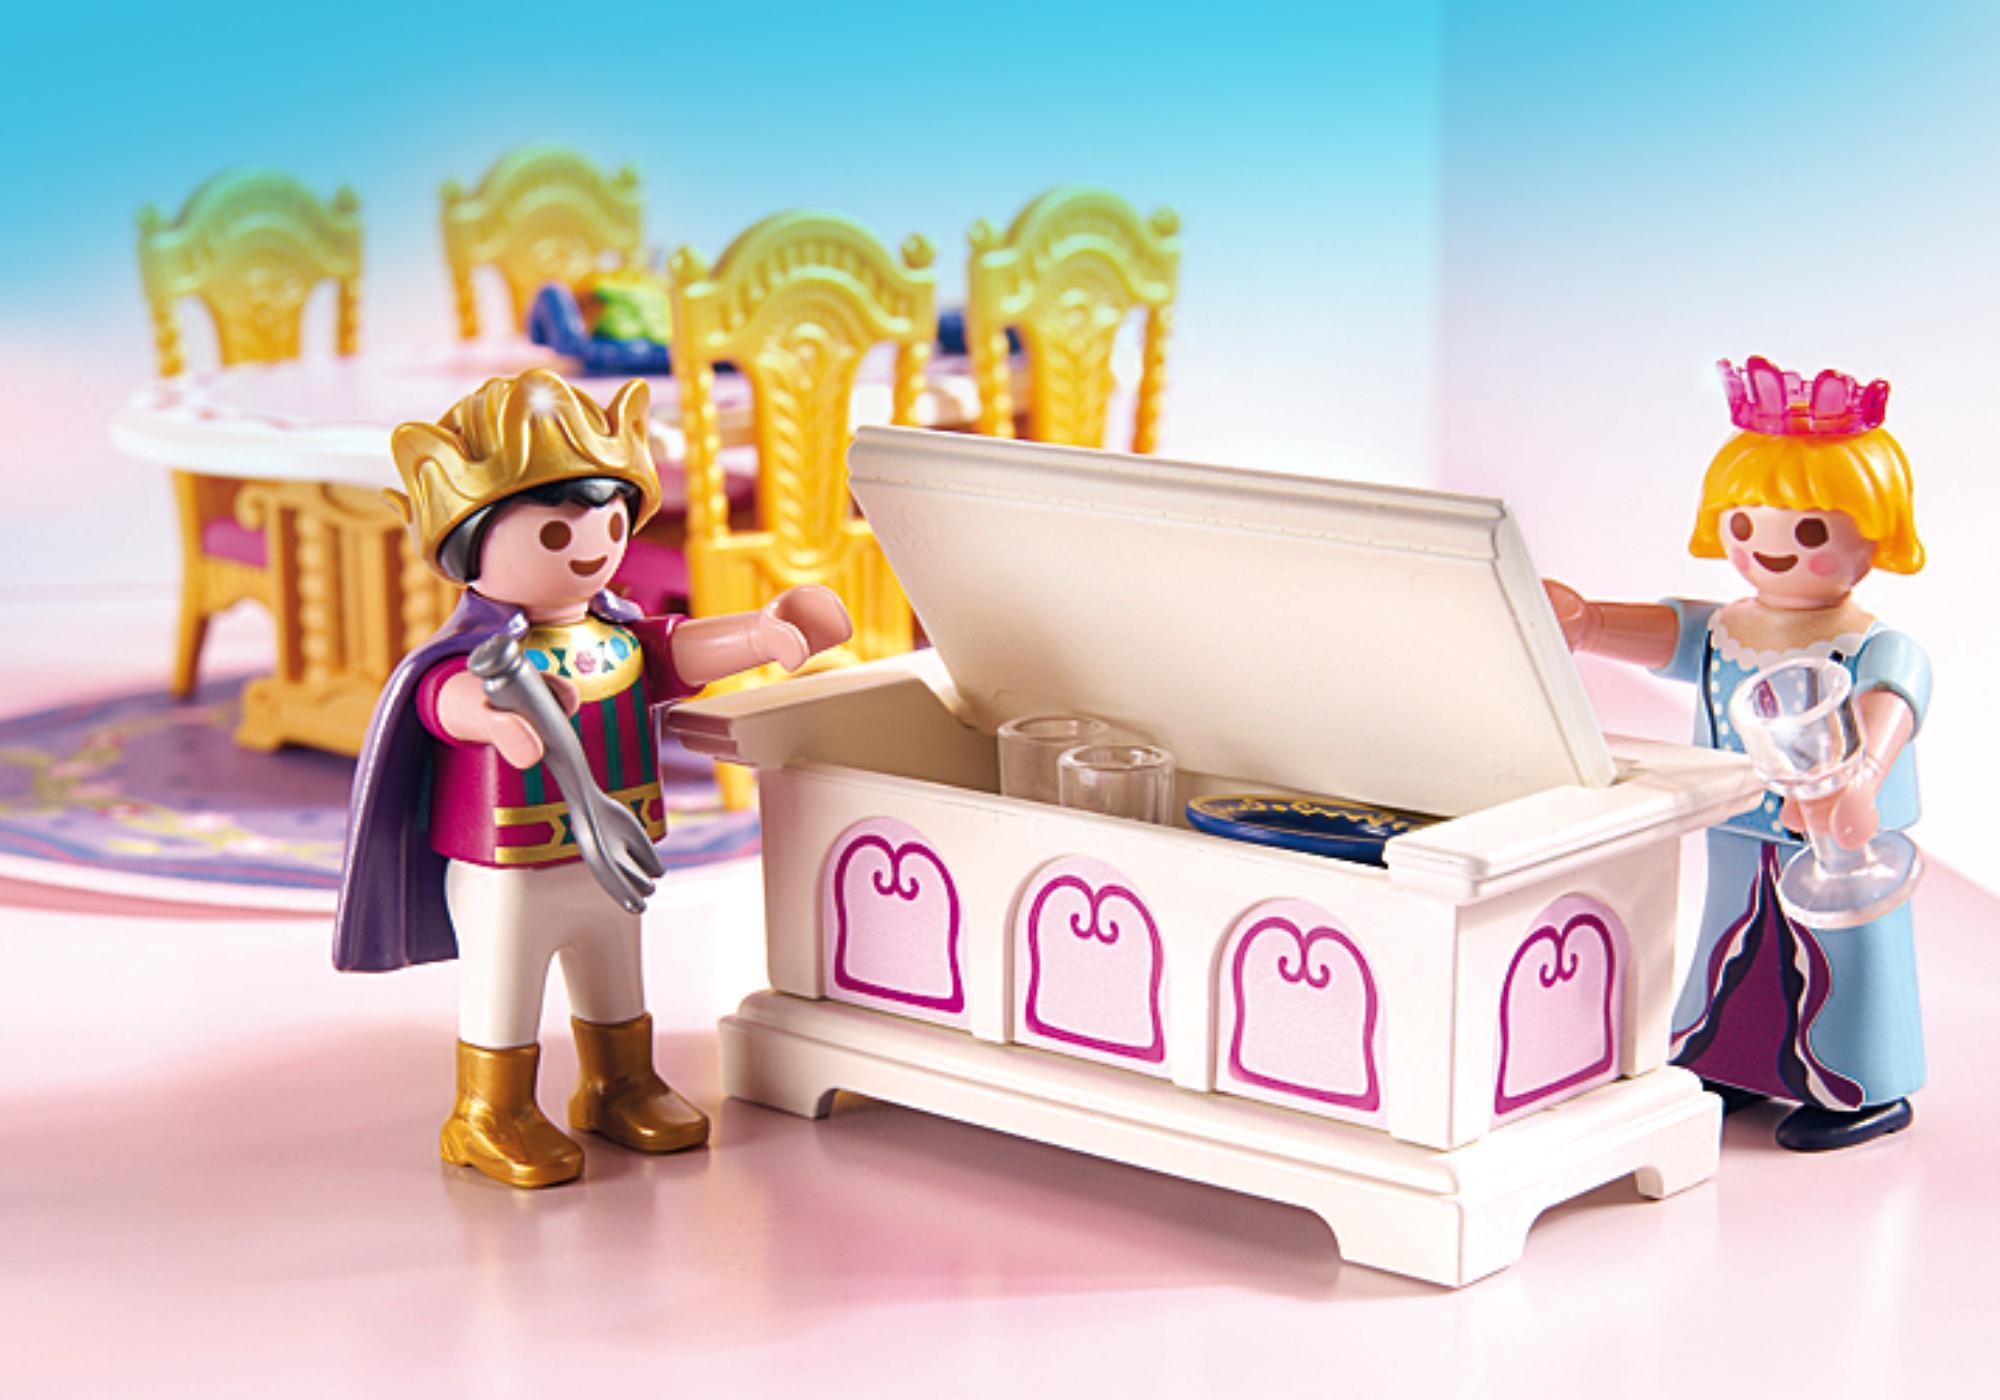 http://media.playmobil.com/i/playmobil/5145_product_extra1